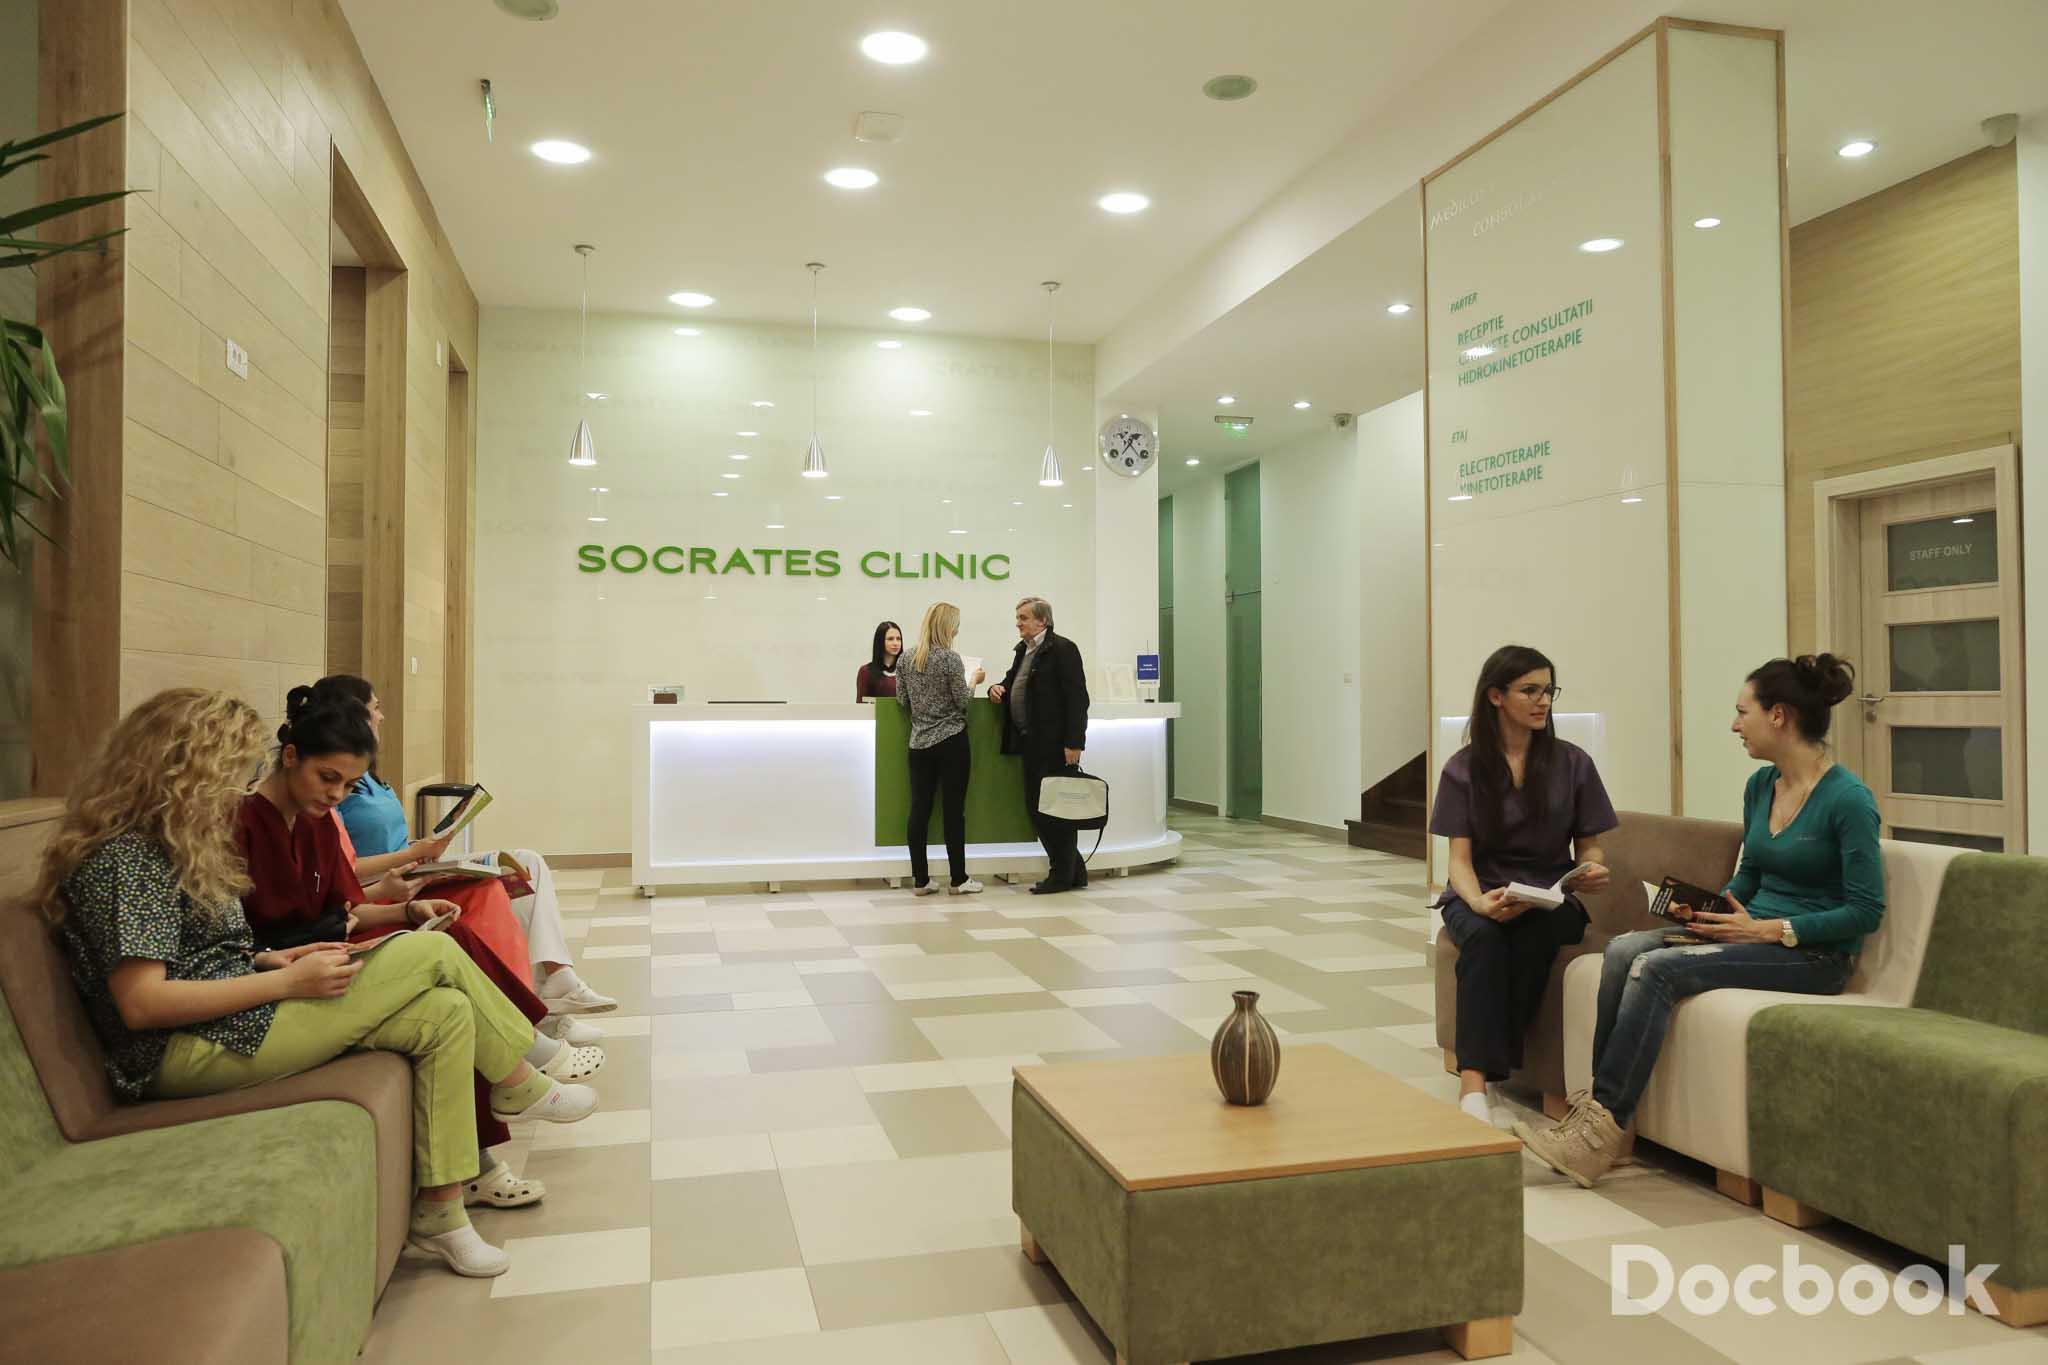 Clinica Socrates Clinic